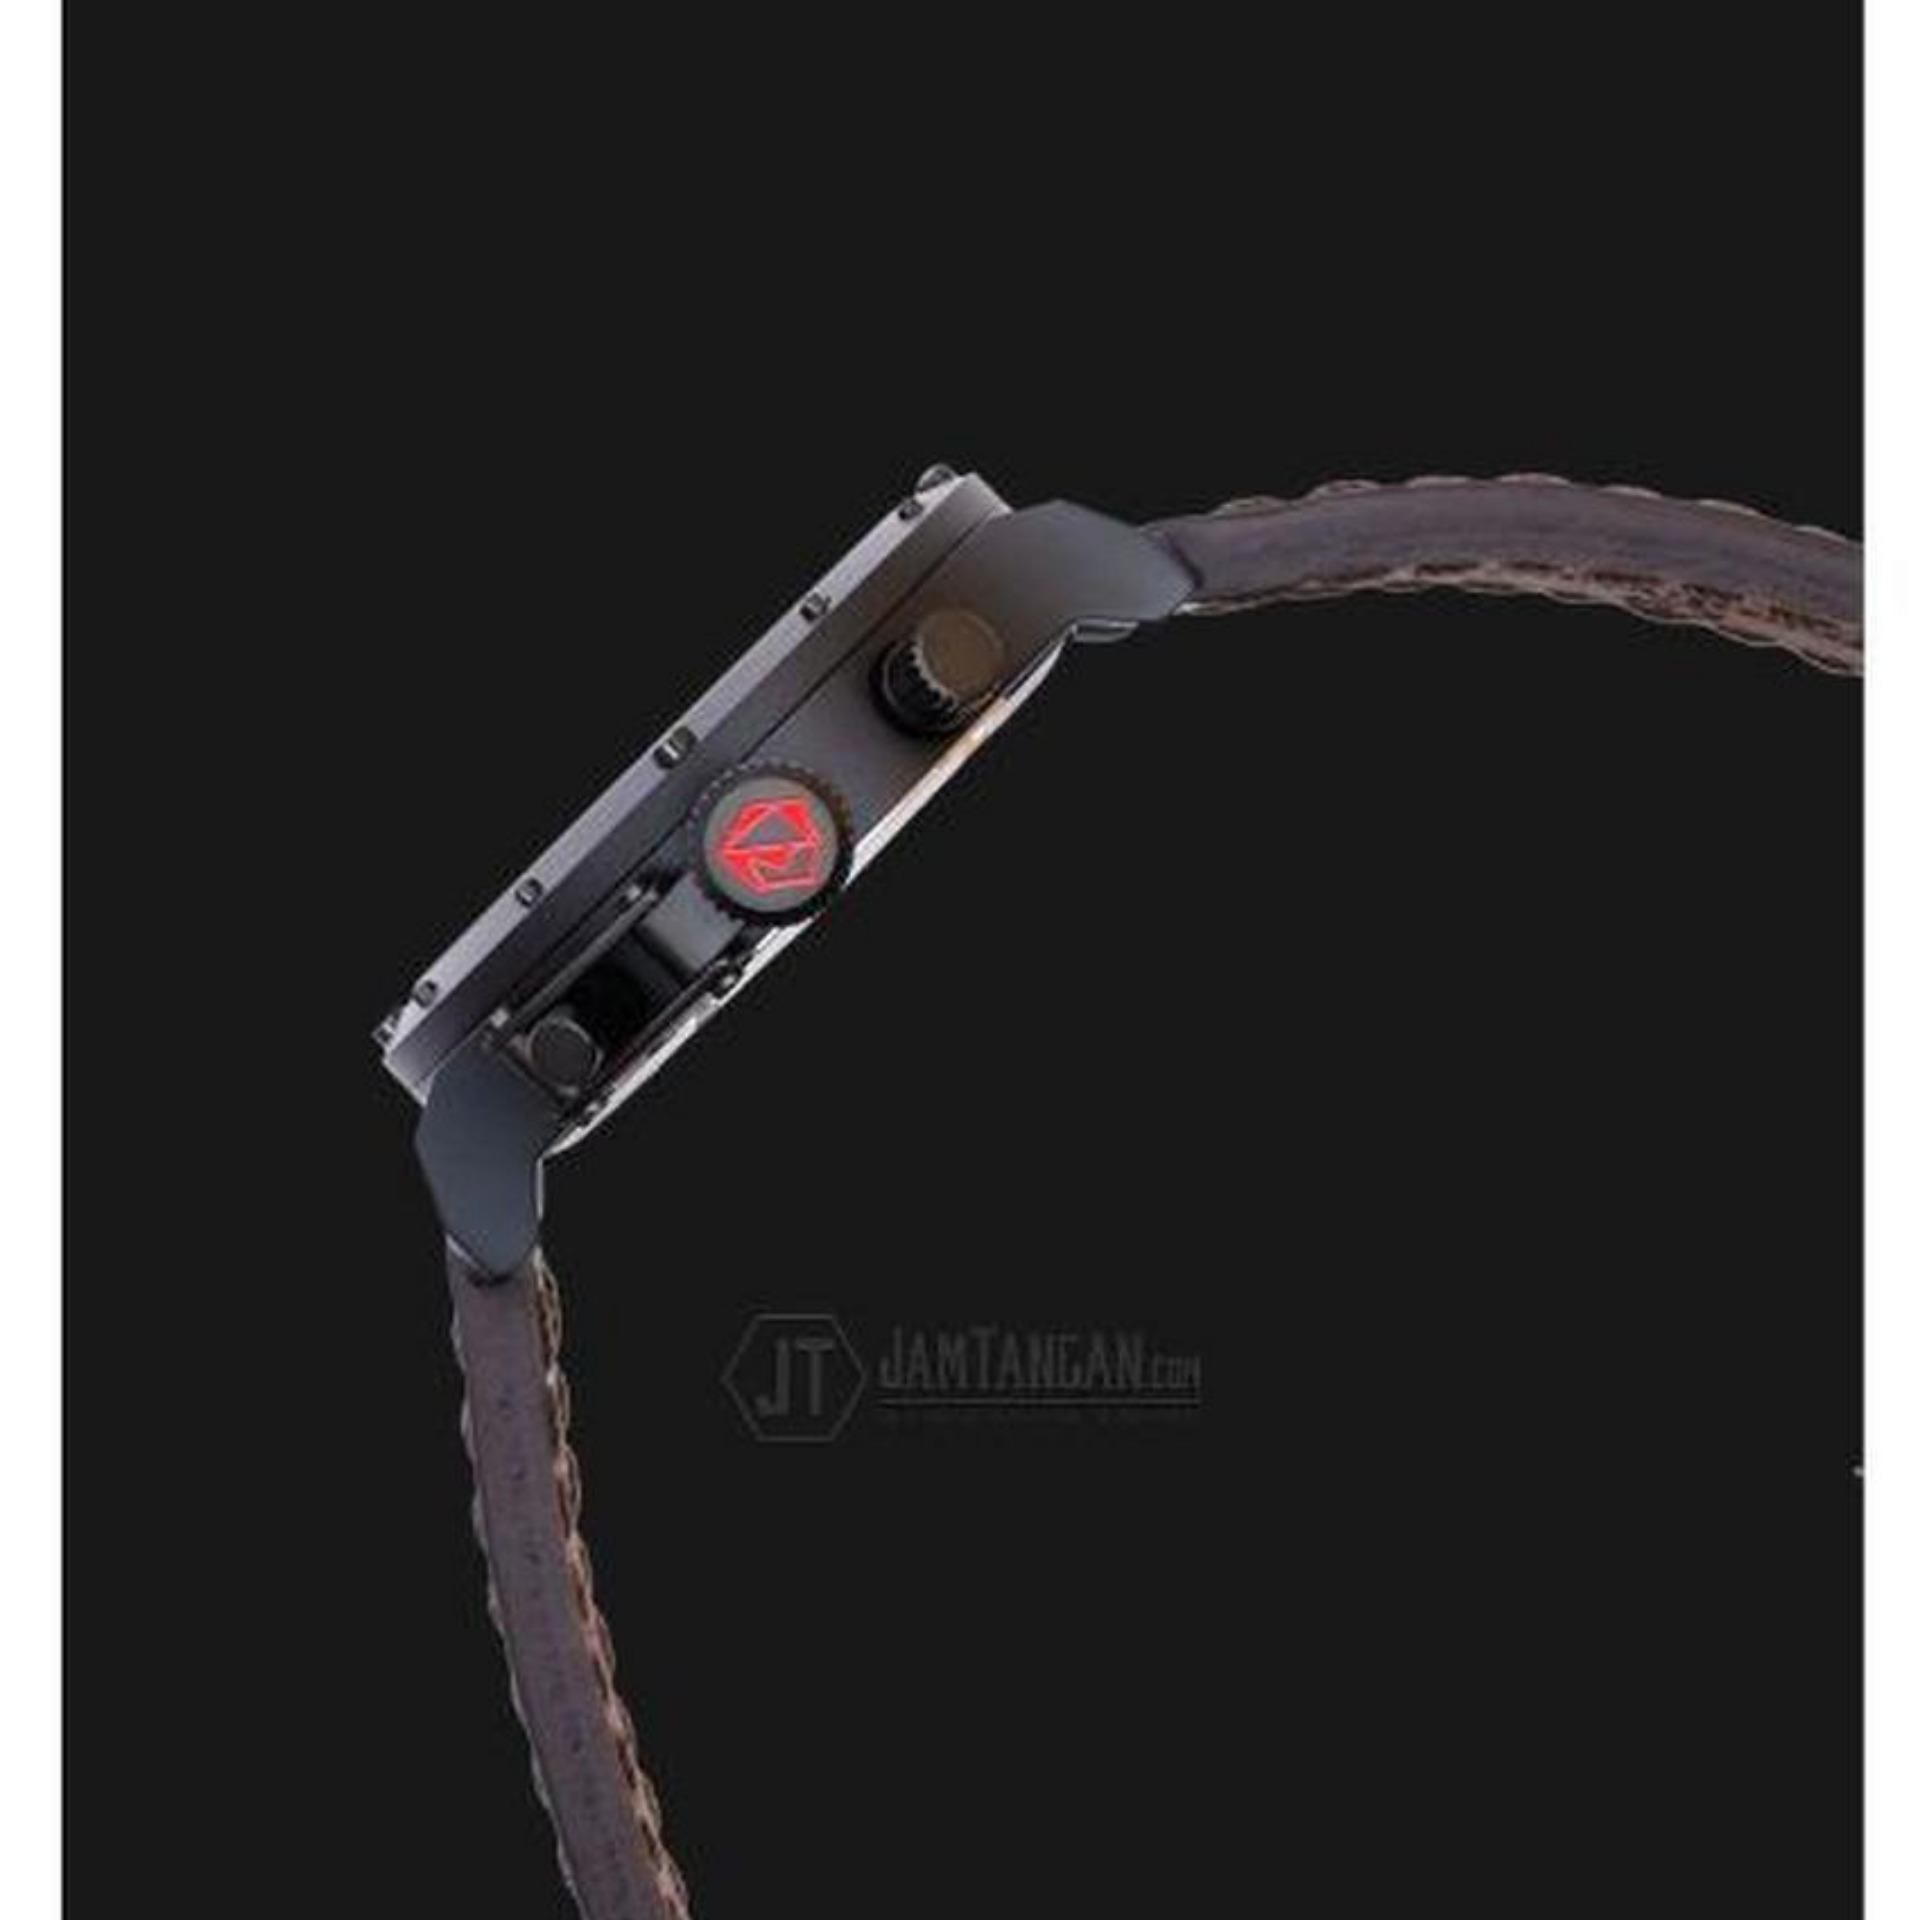 Harga Penawaran Jam Tangan Pria Original Expedition E6381 M E 6381silver Black Mbrown